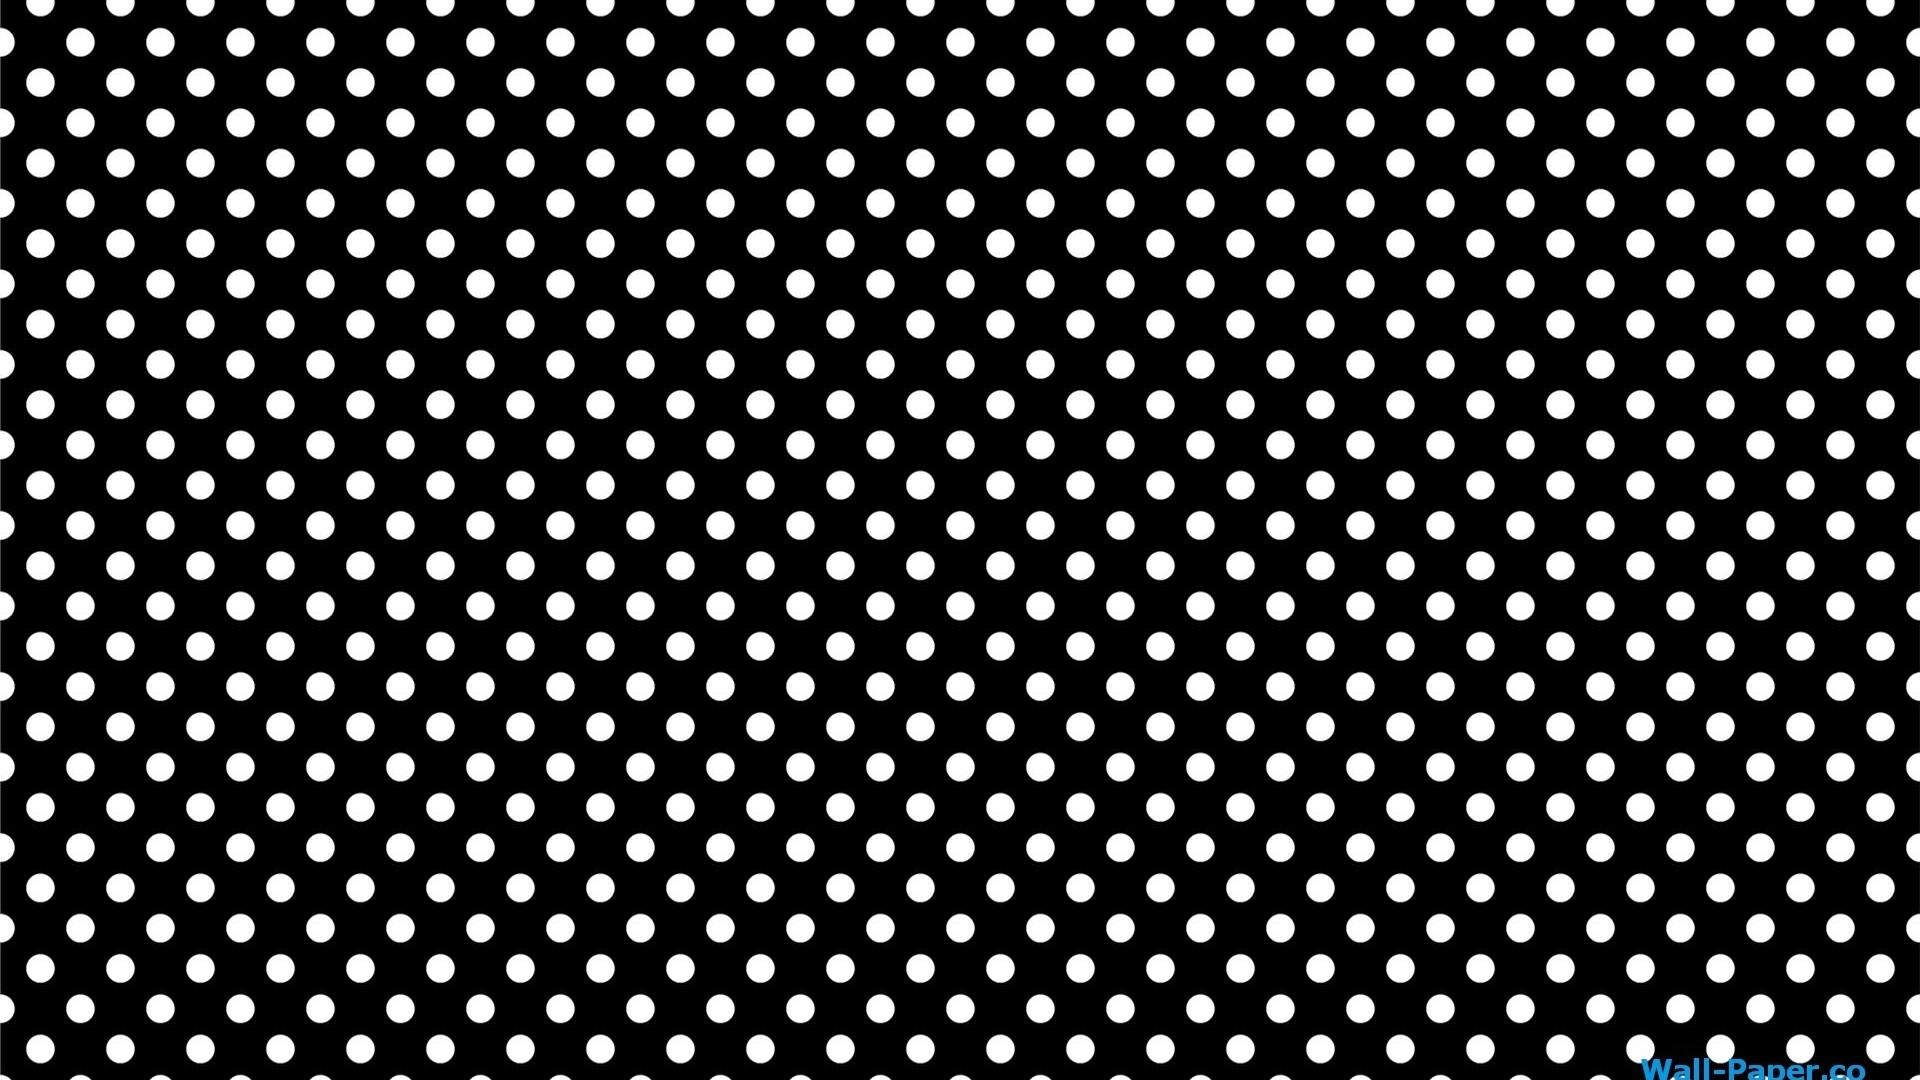 Black and White Dot Wallpaper